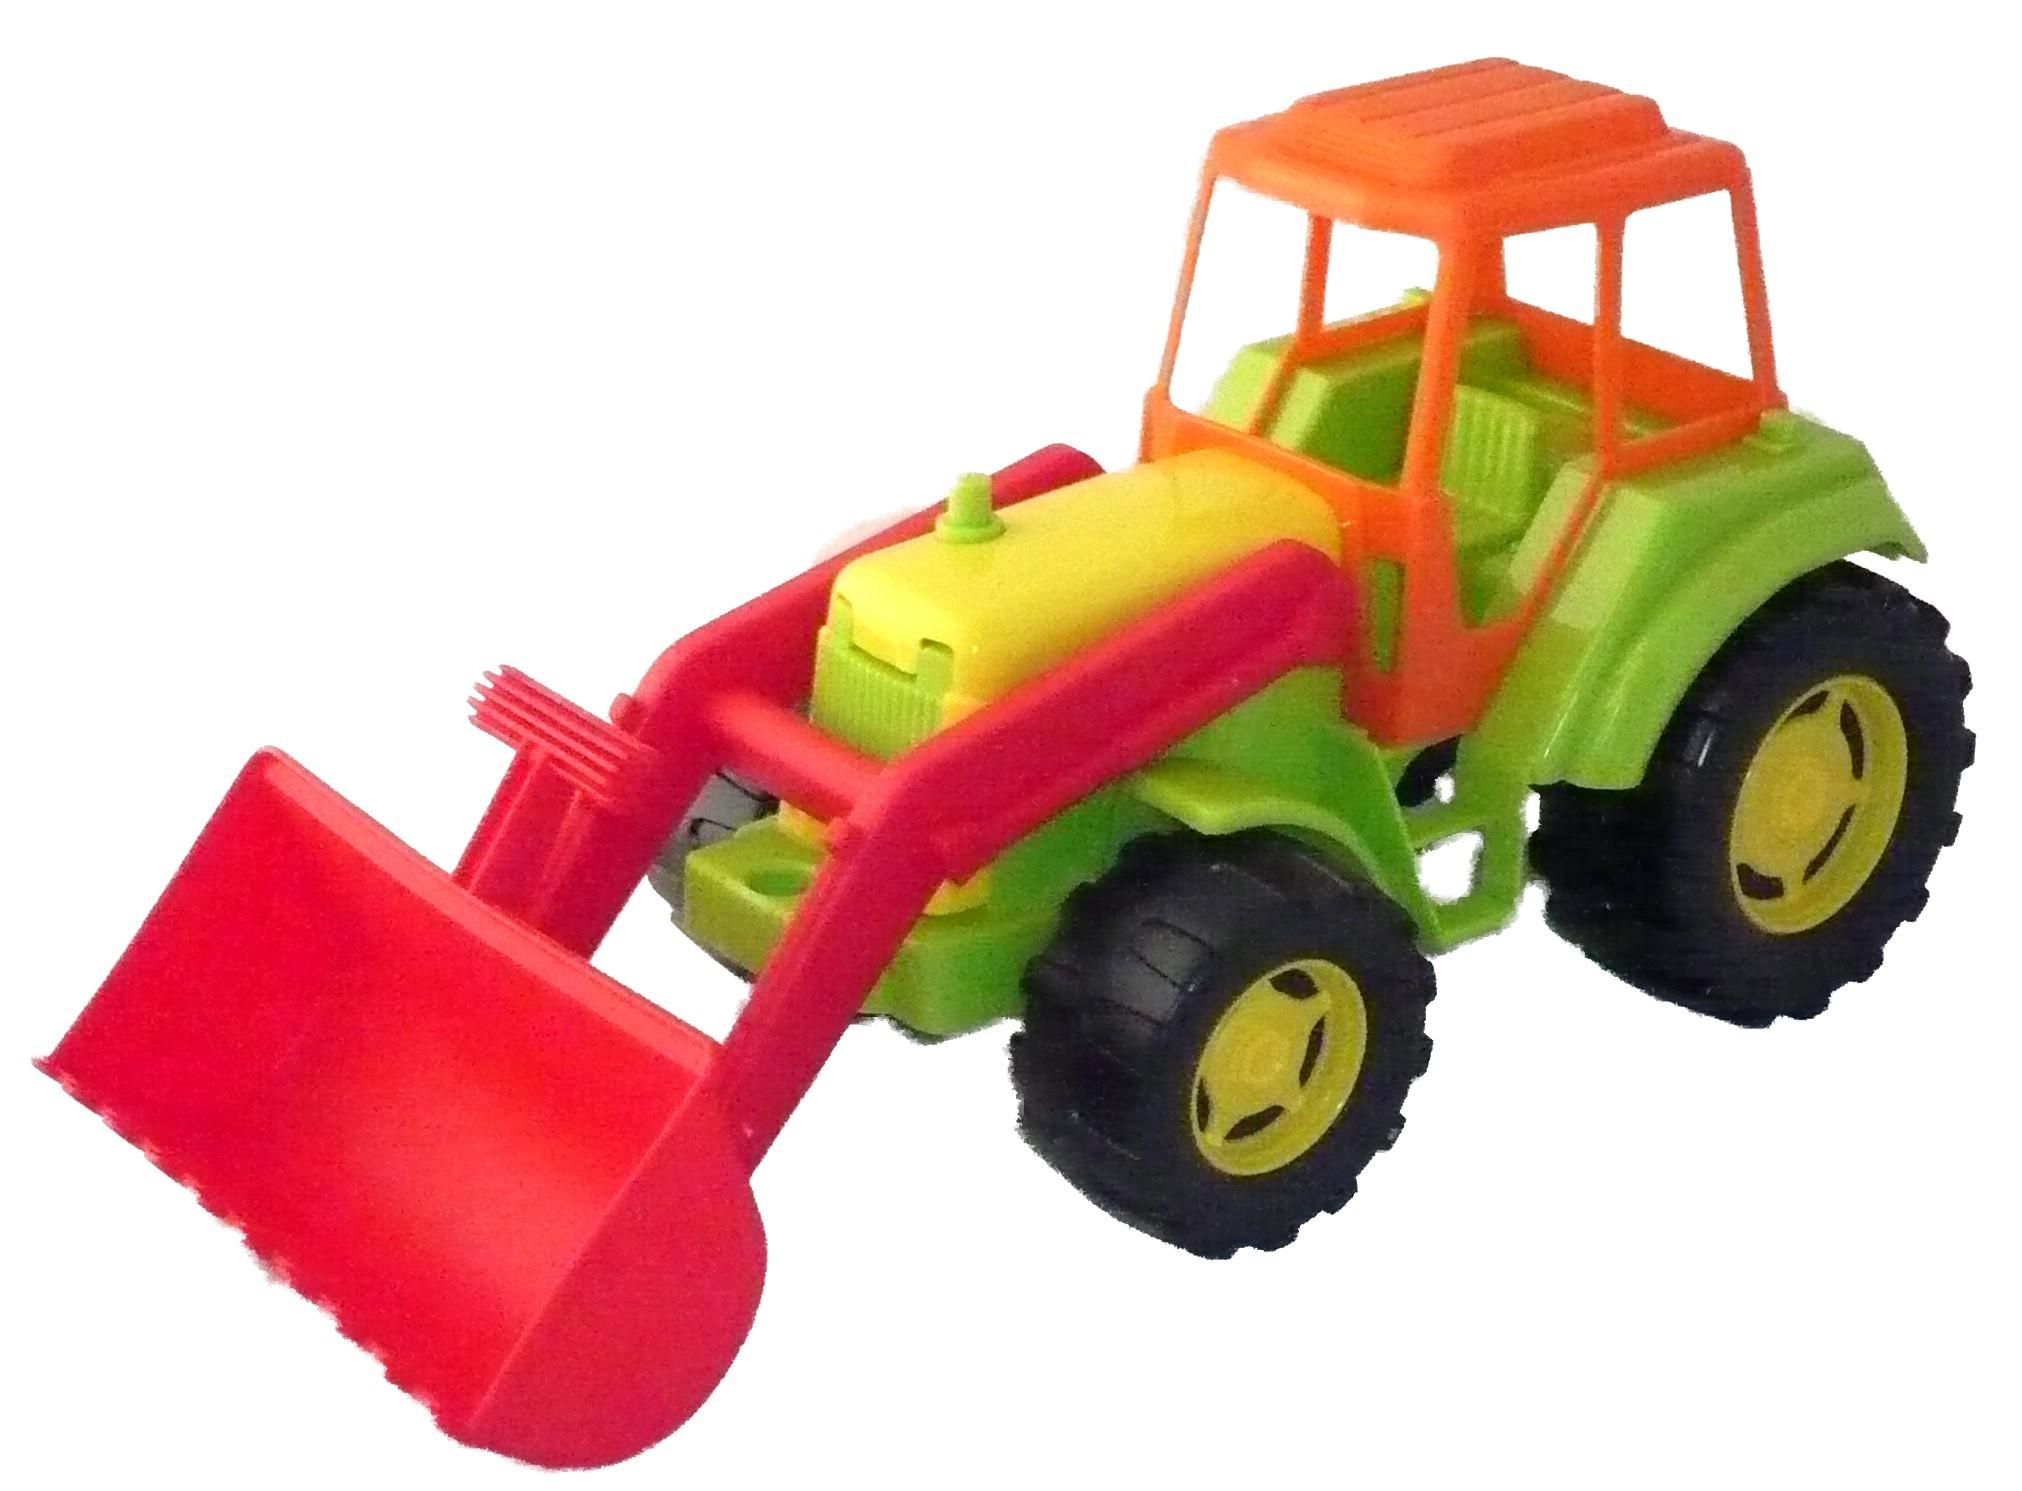 tractopelle jouet tracteur routier occasion renault. Black Bedroom Furniture Sets. Home Design Ideas